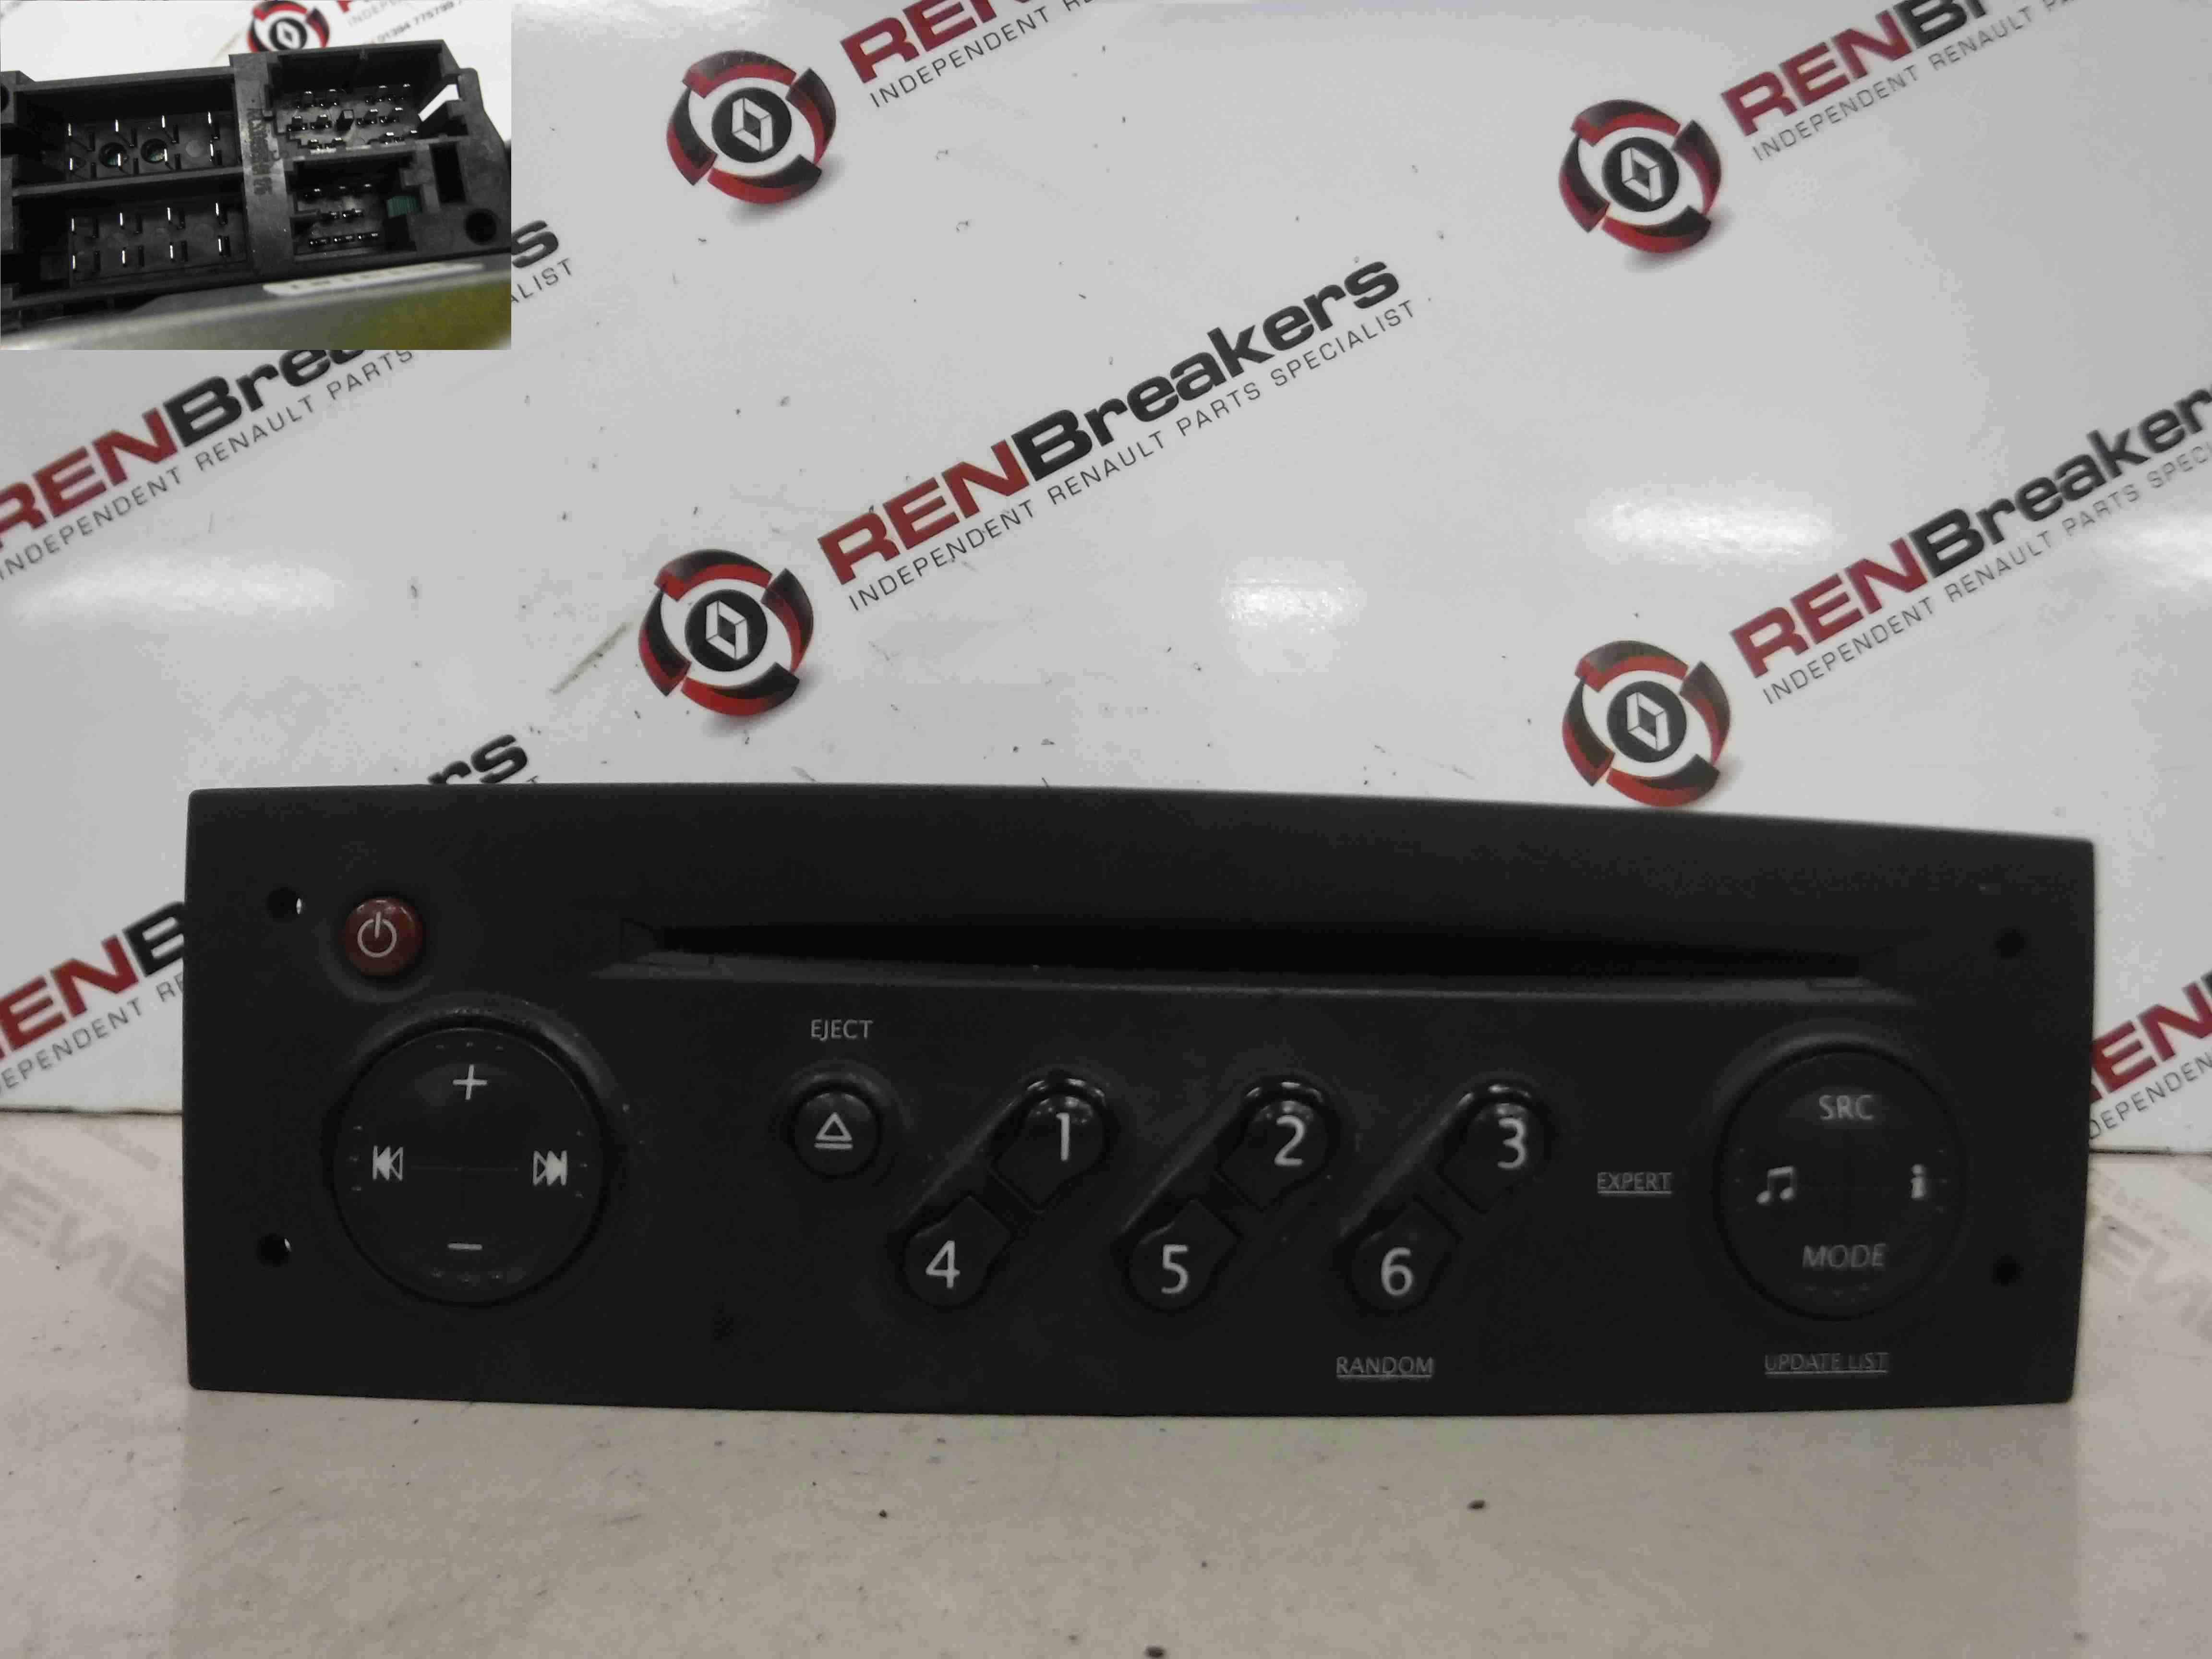 Renault Clio MK3 2005-2009 Radio Cd Player Update List 8200607915